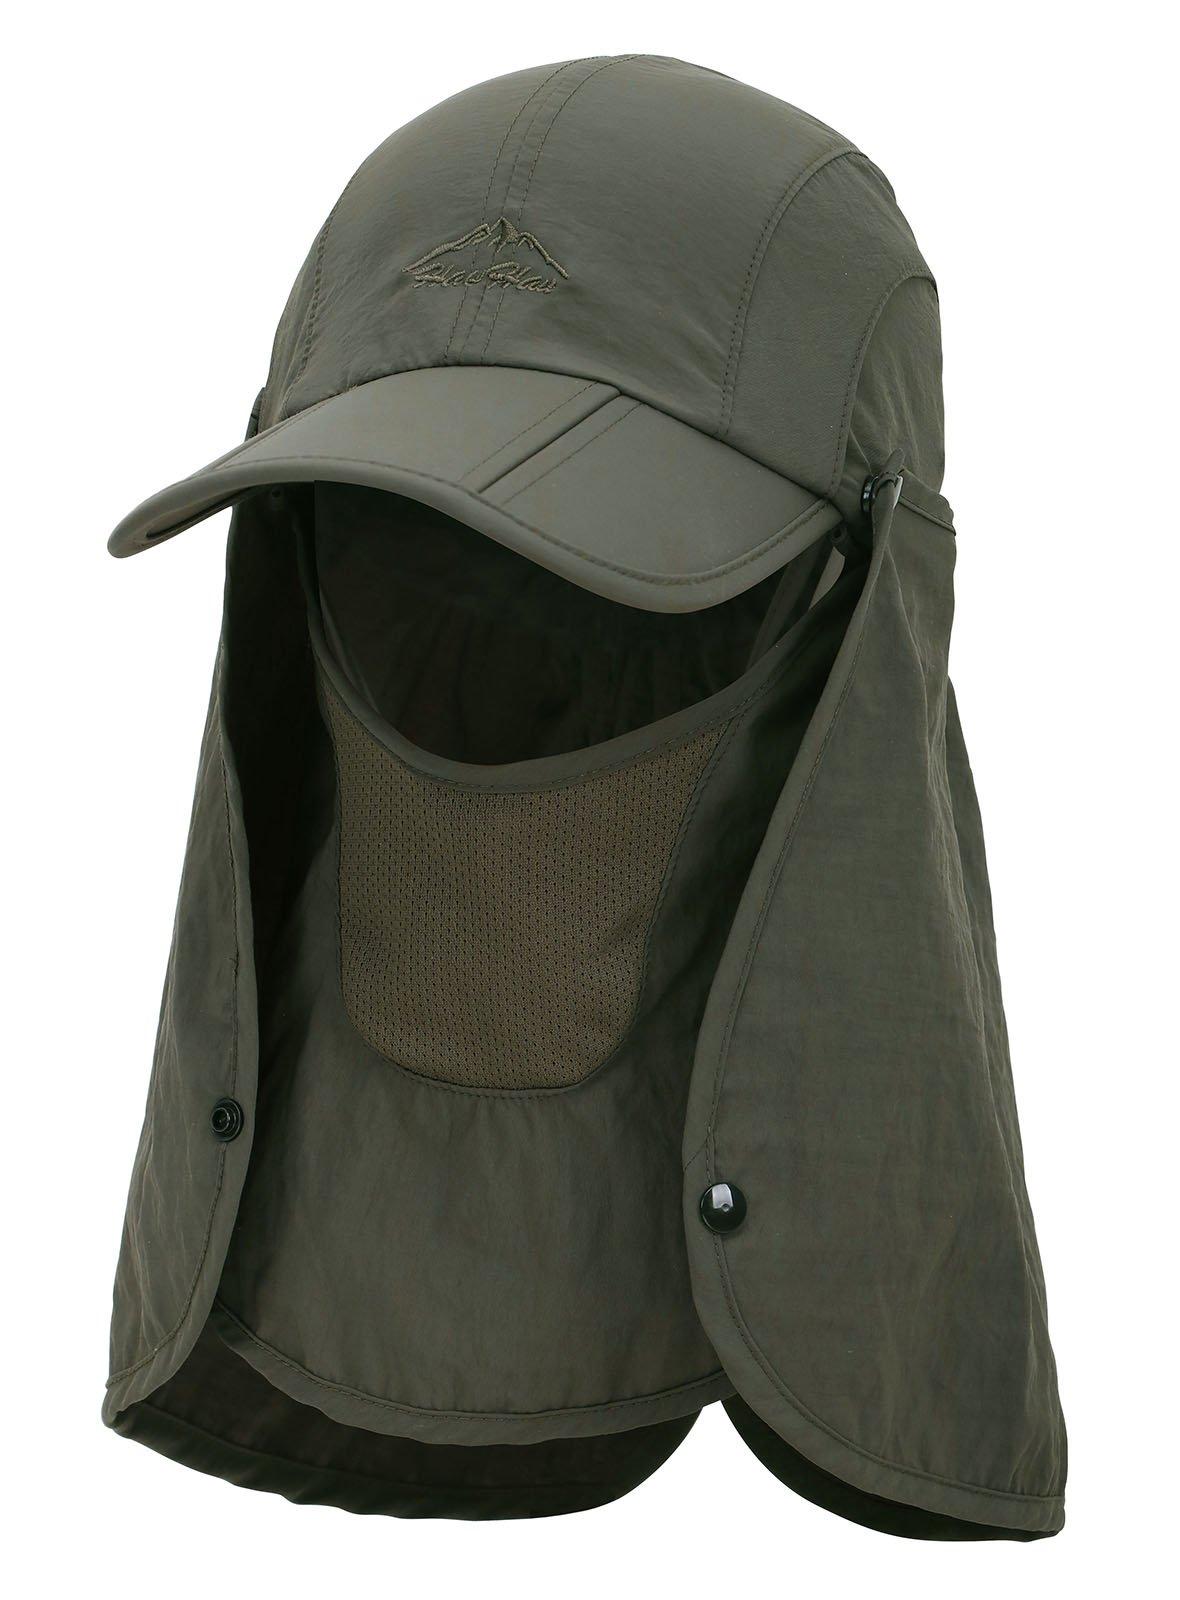 EPYA Sun Hat Outdoors Quick Dry UV Protection Safari Hat w/Flap Neck,Army Green